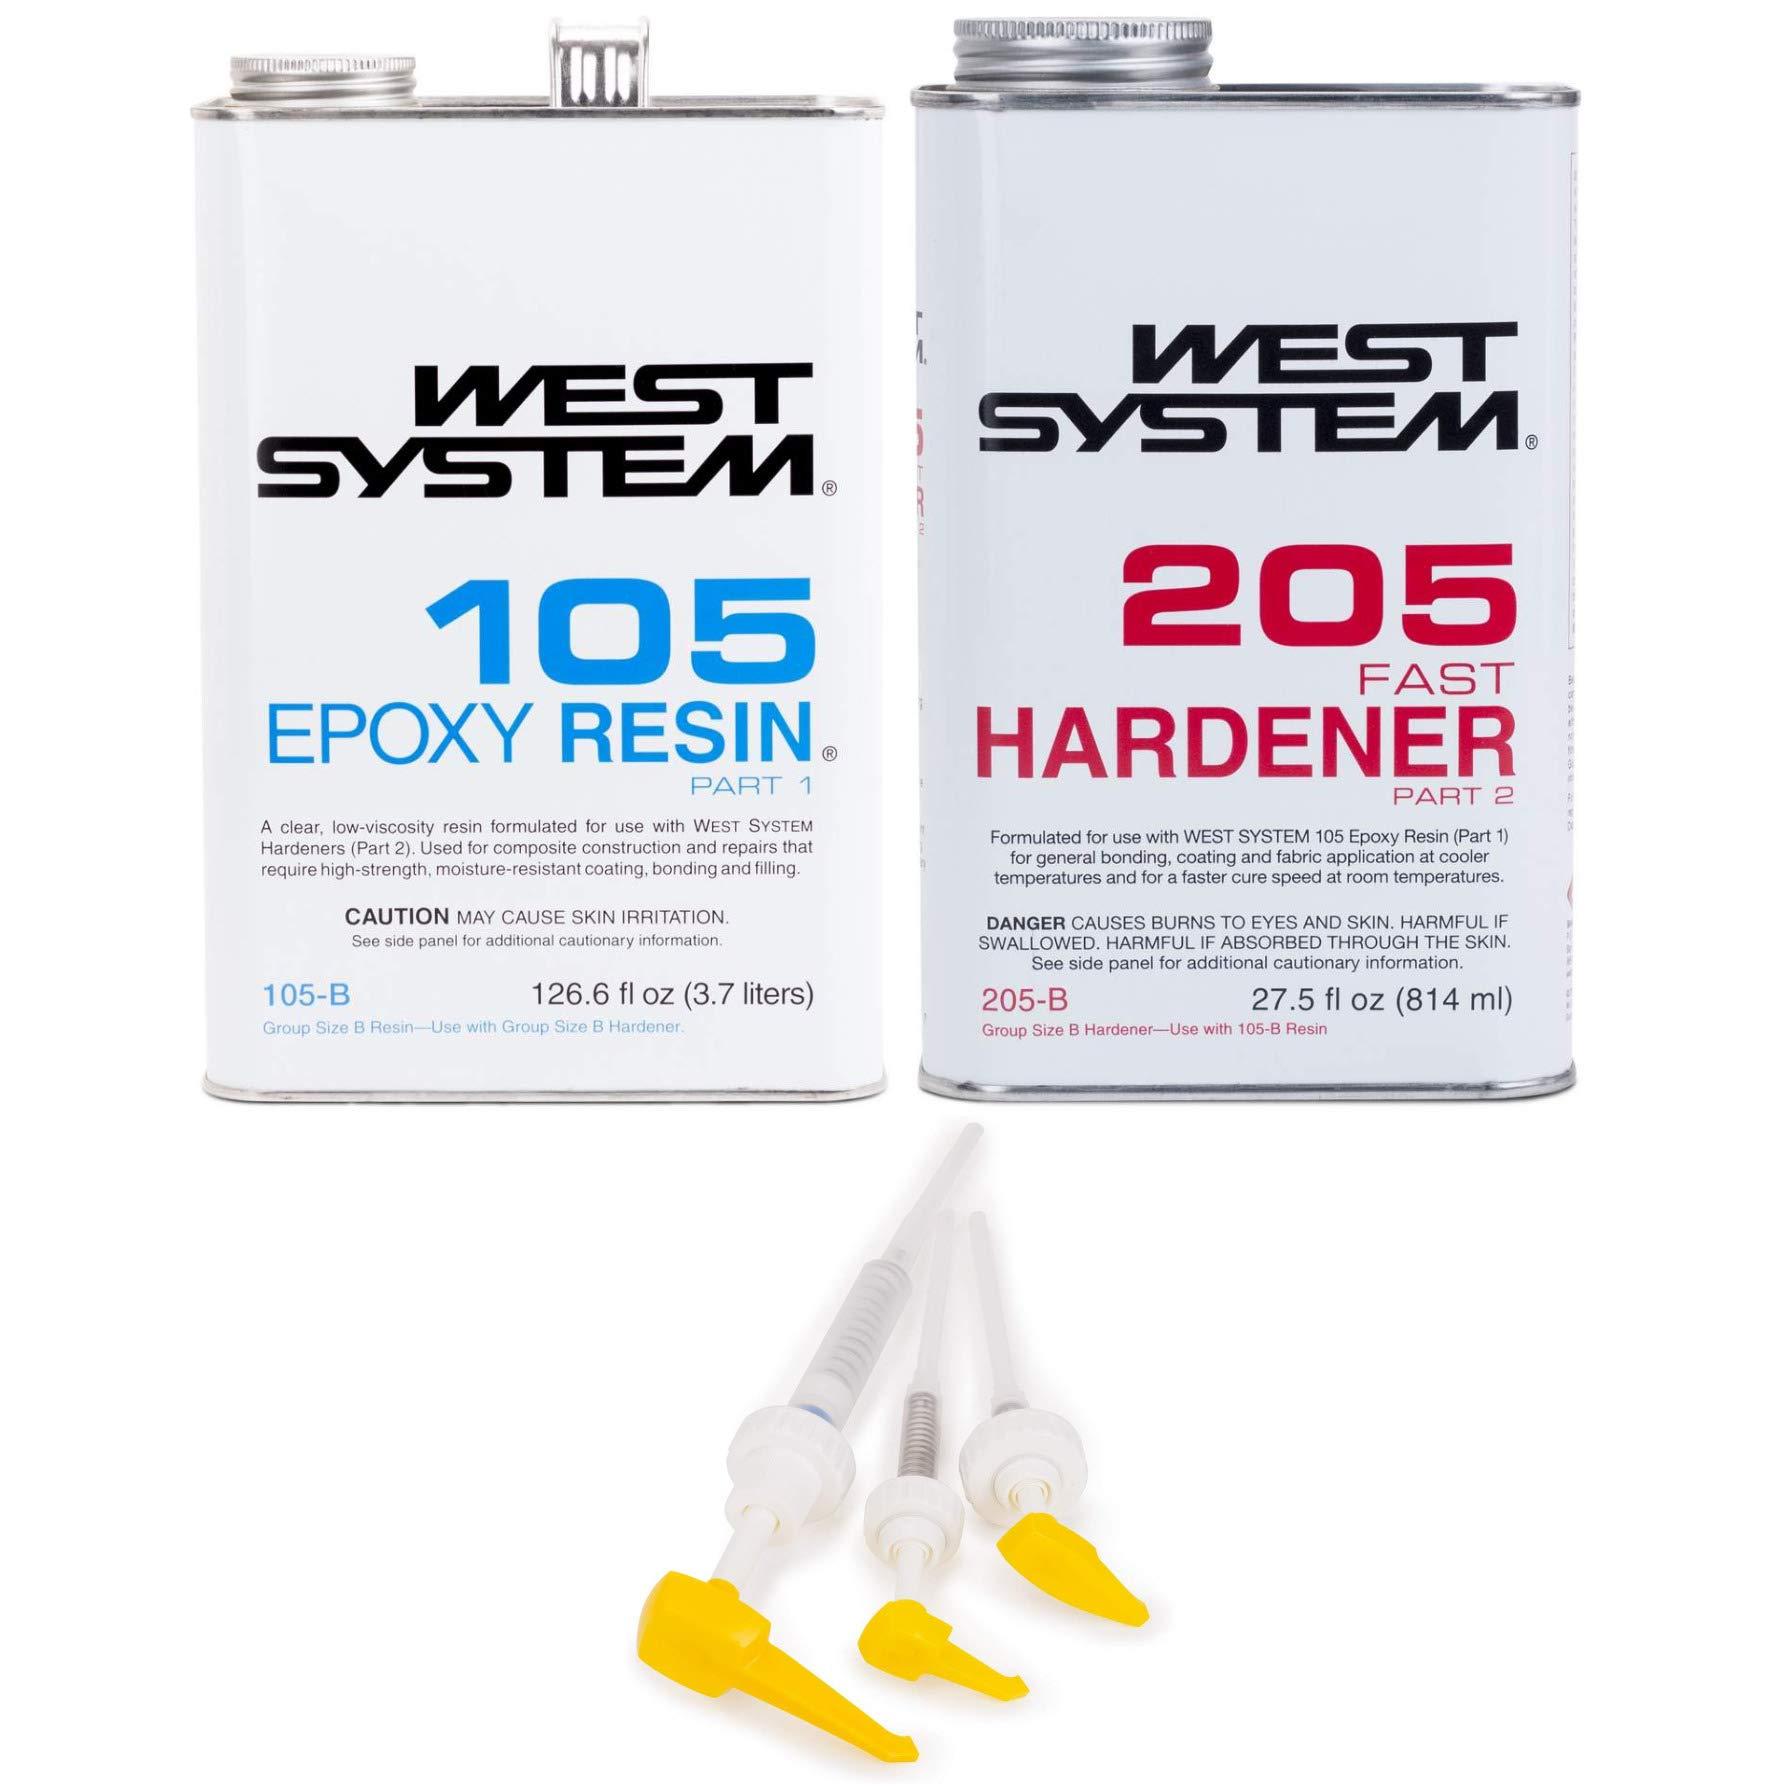 West System 105-B Epoxy Resin (.98 gal) with 205-B Fast Epoxy Hardener (.86 qt) and Mini Epoxy Metering Pump Set